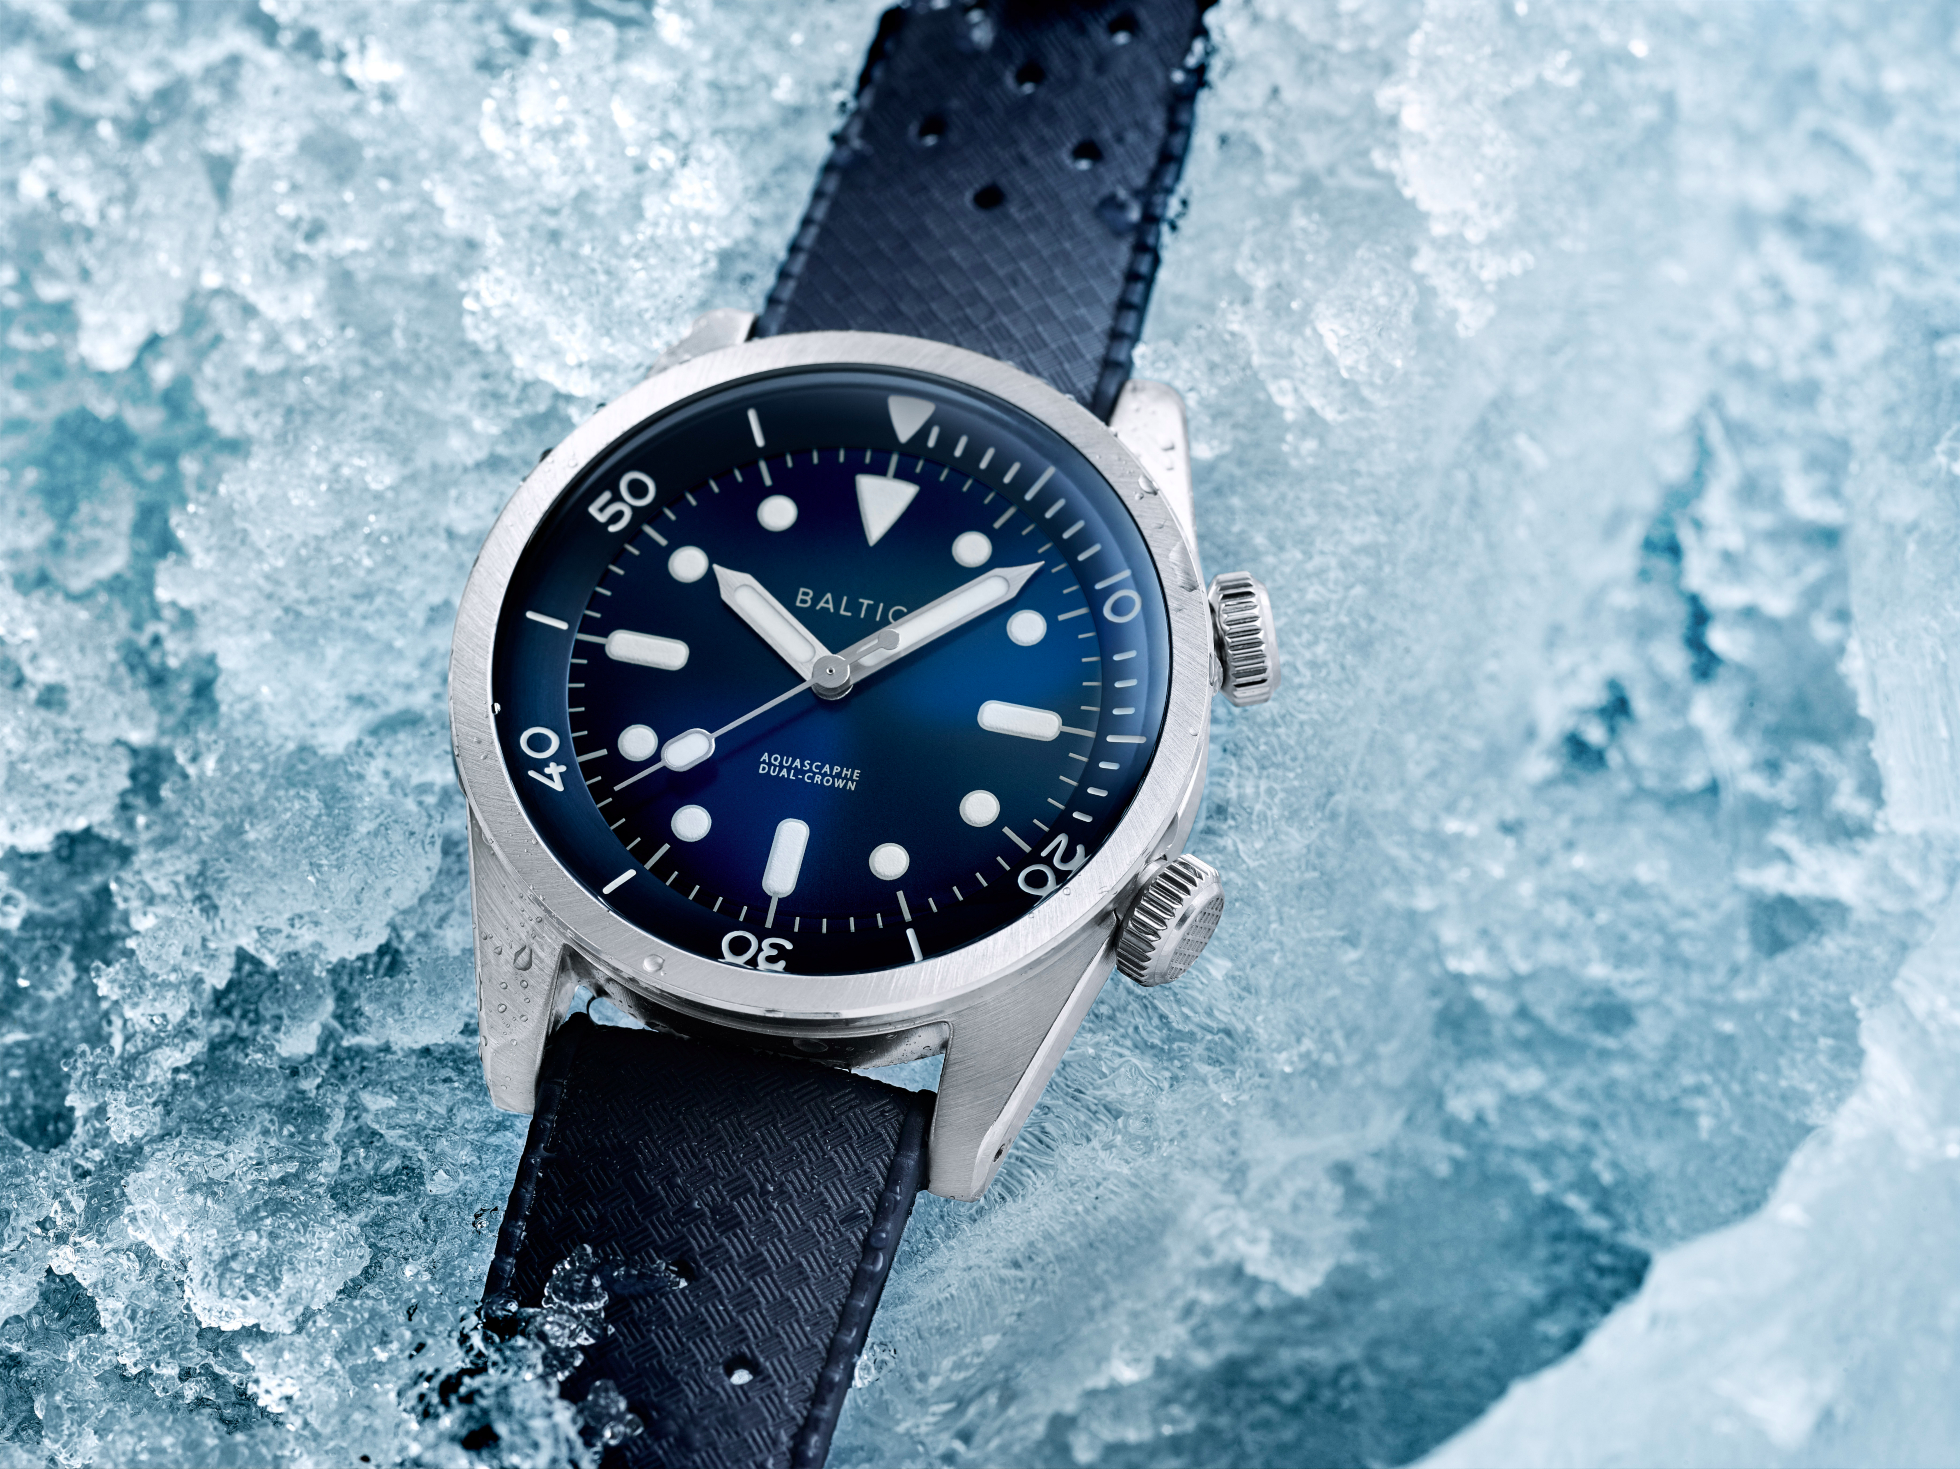 Baltic Aquascaphe Dual Crown offers a fresh take on the compressor